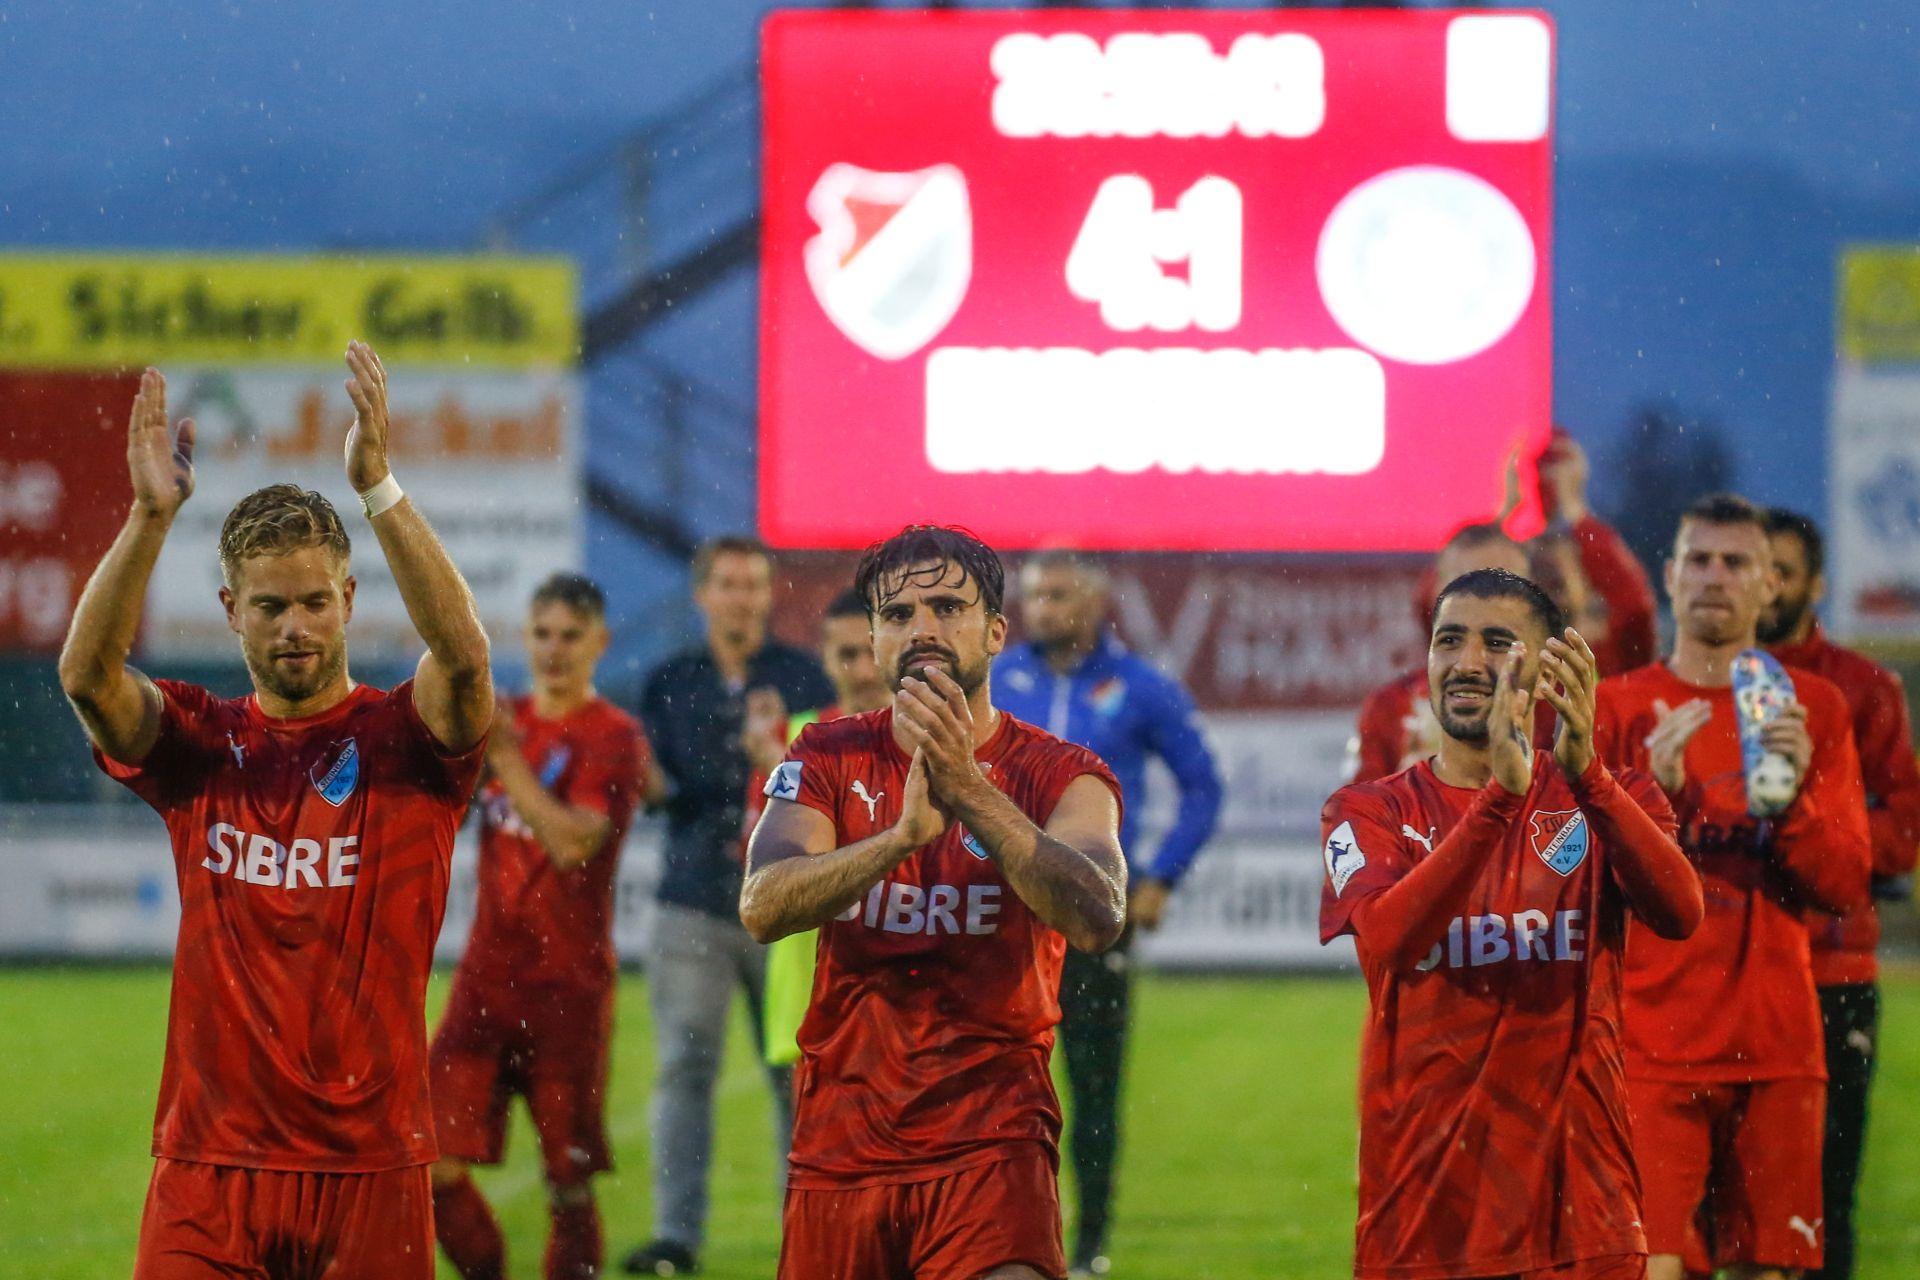 Sascha Marquet (TSV Steinbach), David Damm Al-Azzawe (TSV Steinbach), Serhat Ilhan - TSV Steinbach vs. FC Bayern Alzenau am 9.8.2019 (Foto: Fingerhut)